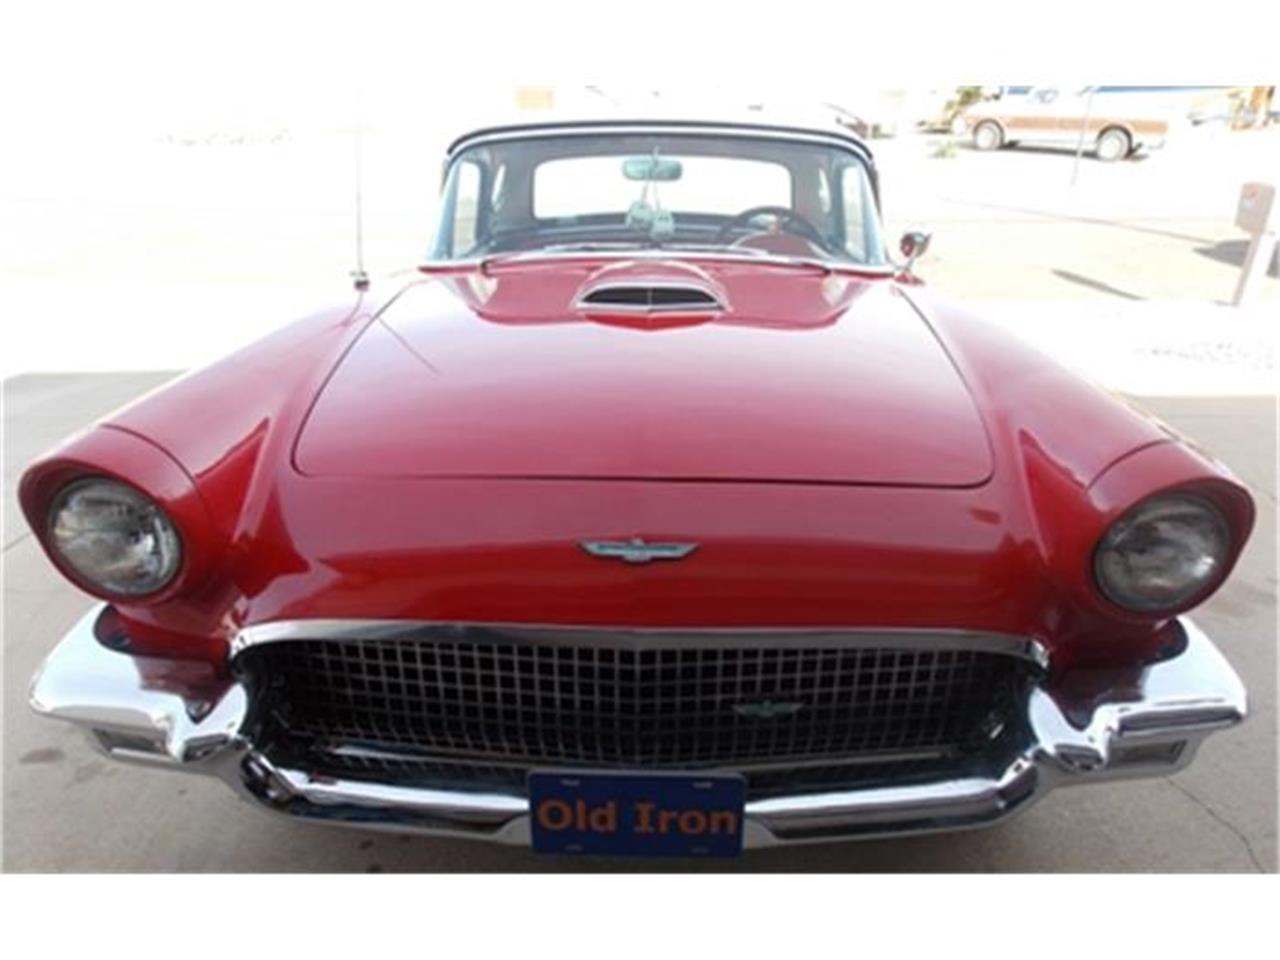 Muscle Car For Sale Tuscon Arizona